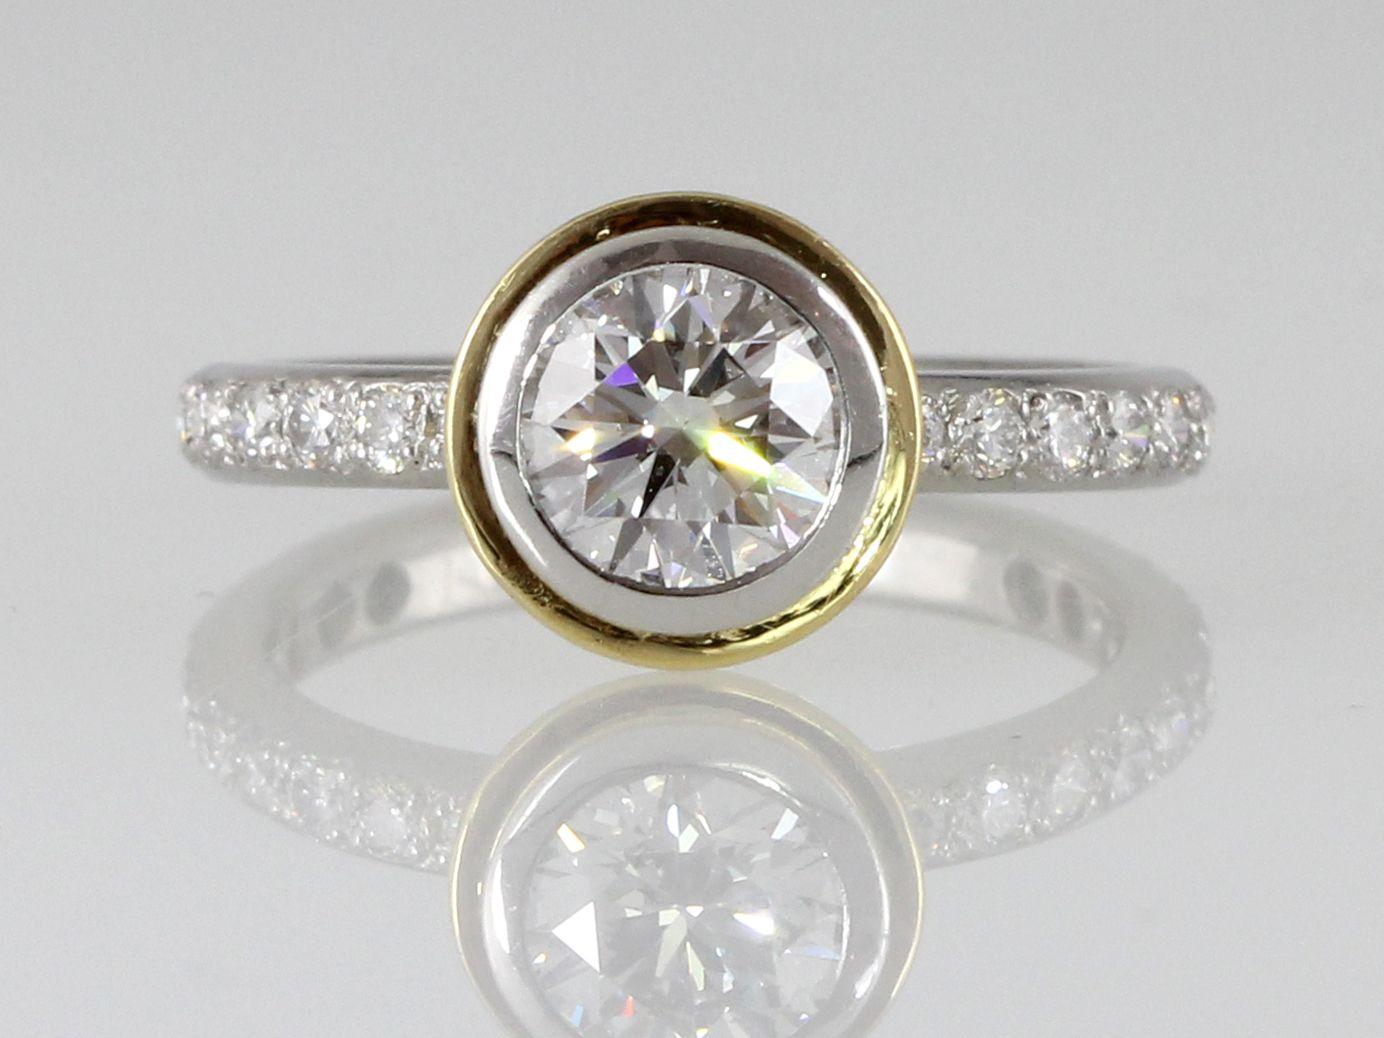 Platinum & Gold double bezel diamond engagement ring.  Handmade at Union Street Goldsmith, San Francisco